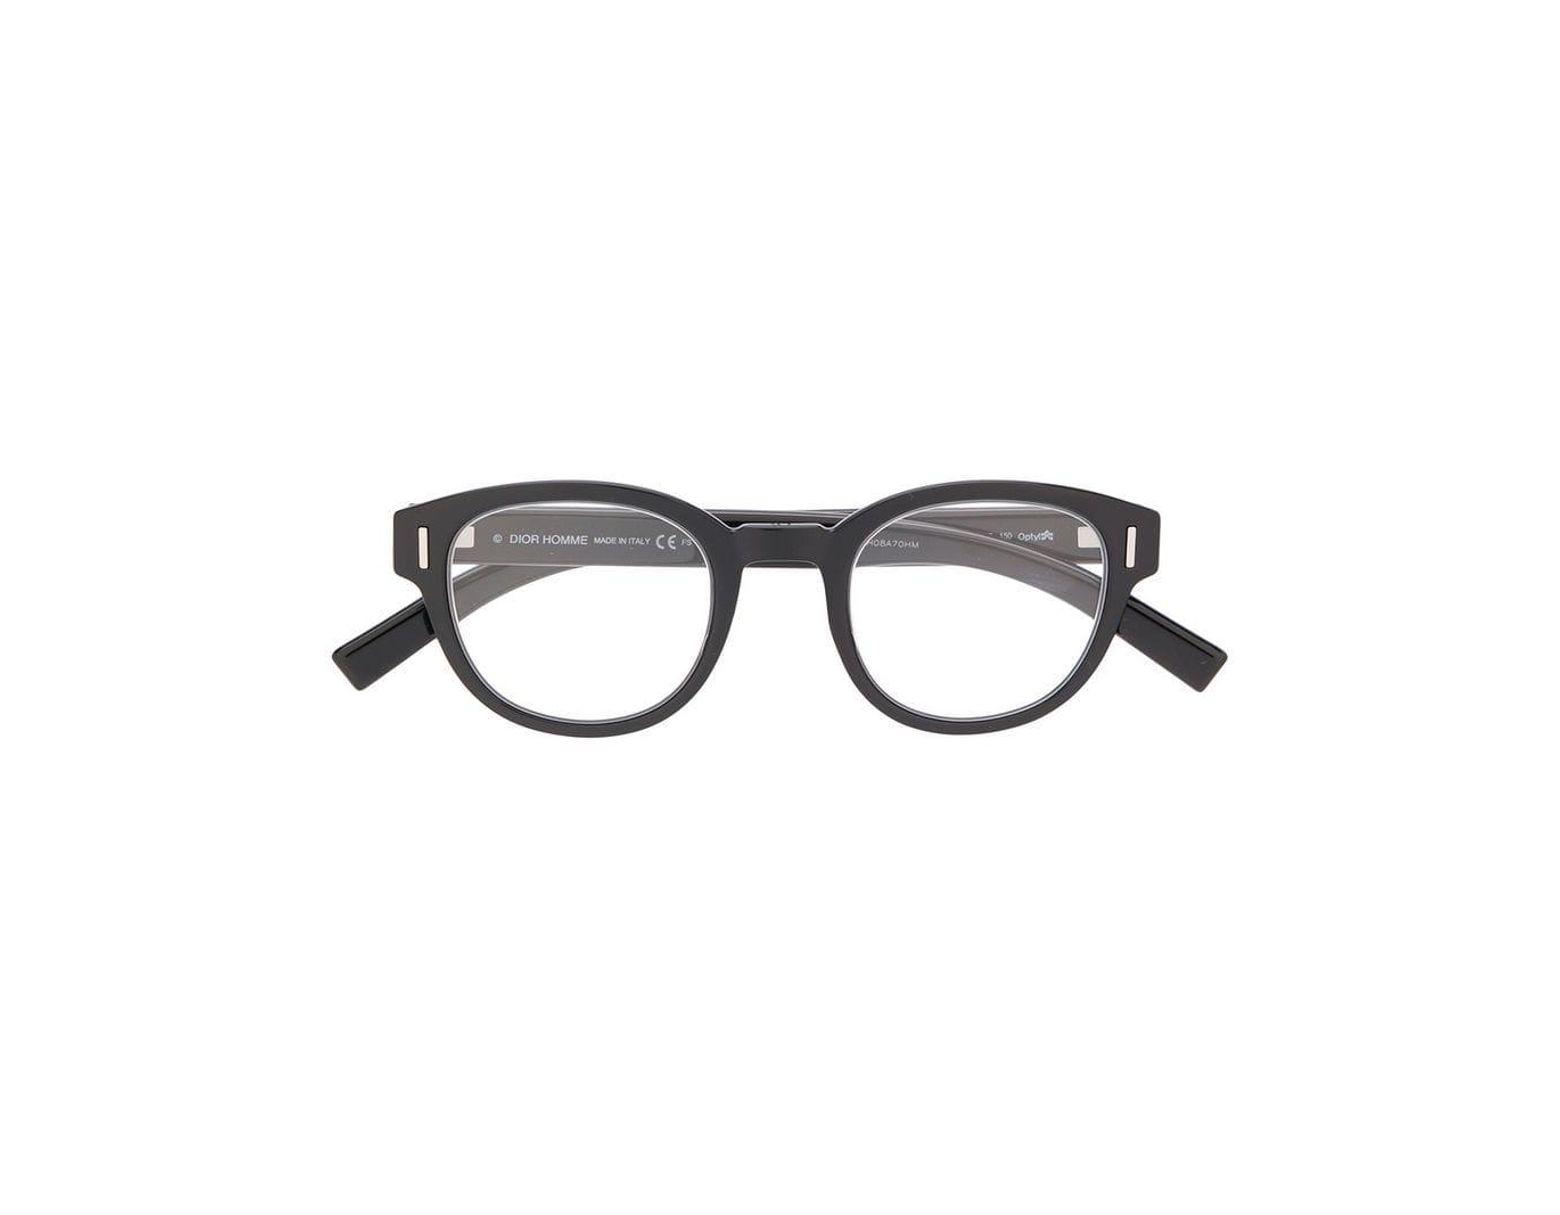 7bae3f6d68e3c Dior Diorfraction 03 Glasses in Black for Men - Lyst